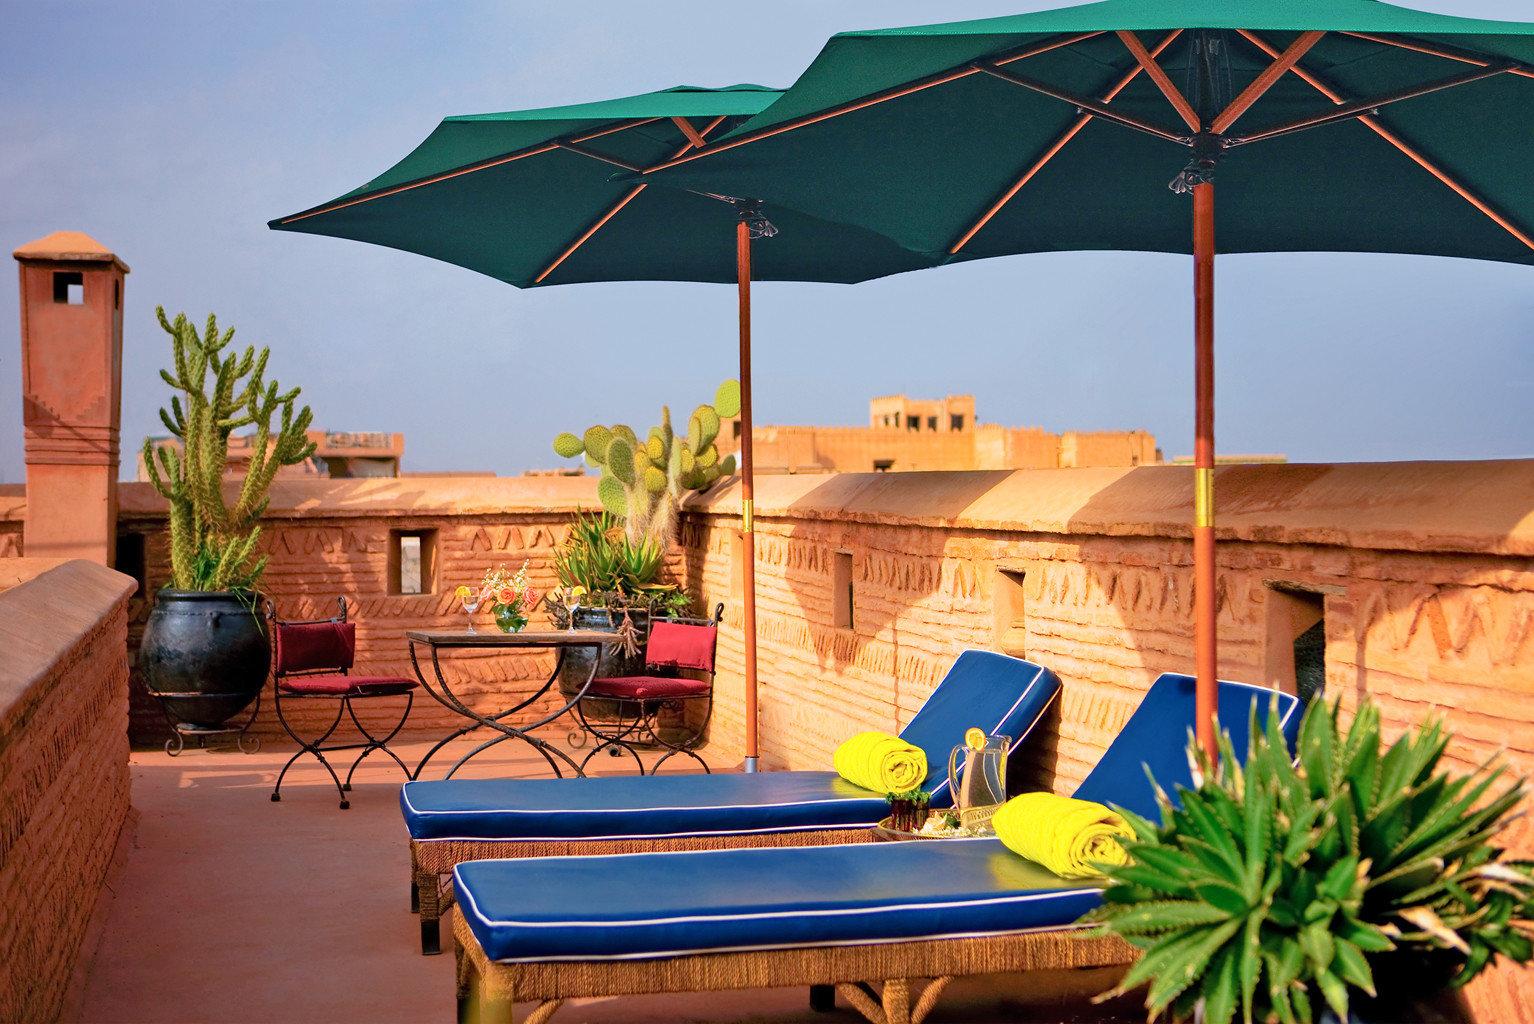 Wellness house umbrella swimming pool backyard gazebo outdoor structure Resort plant Villa